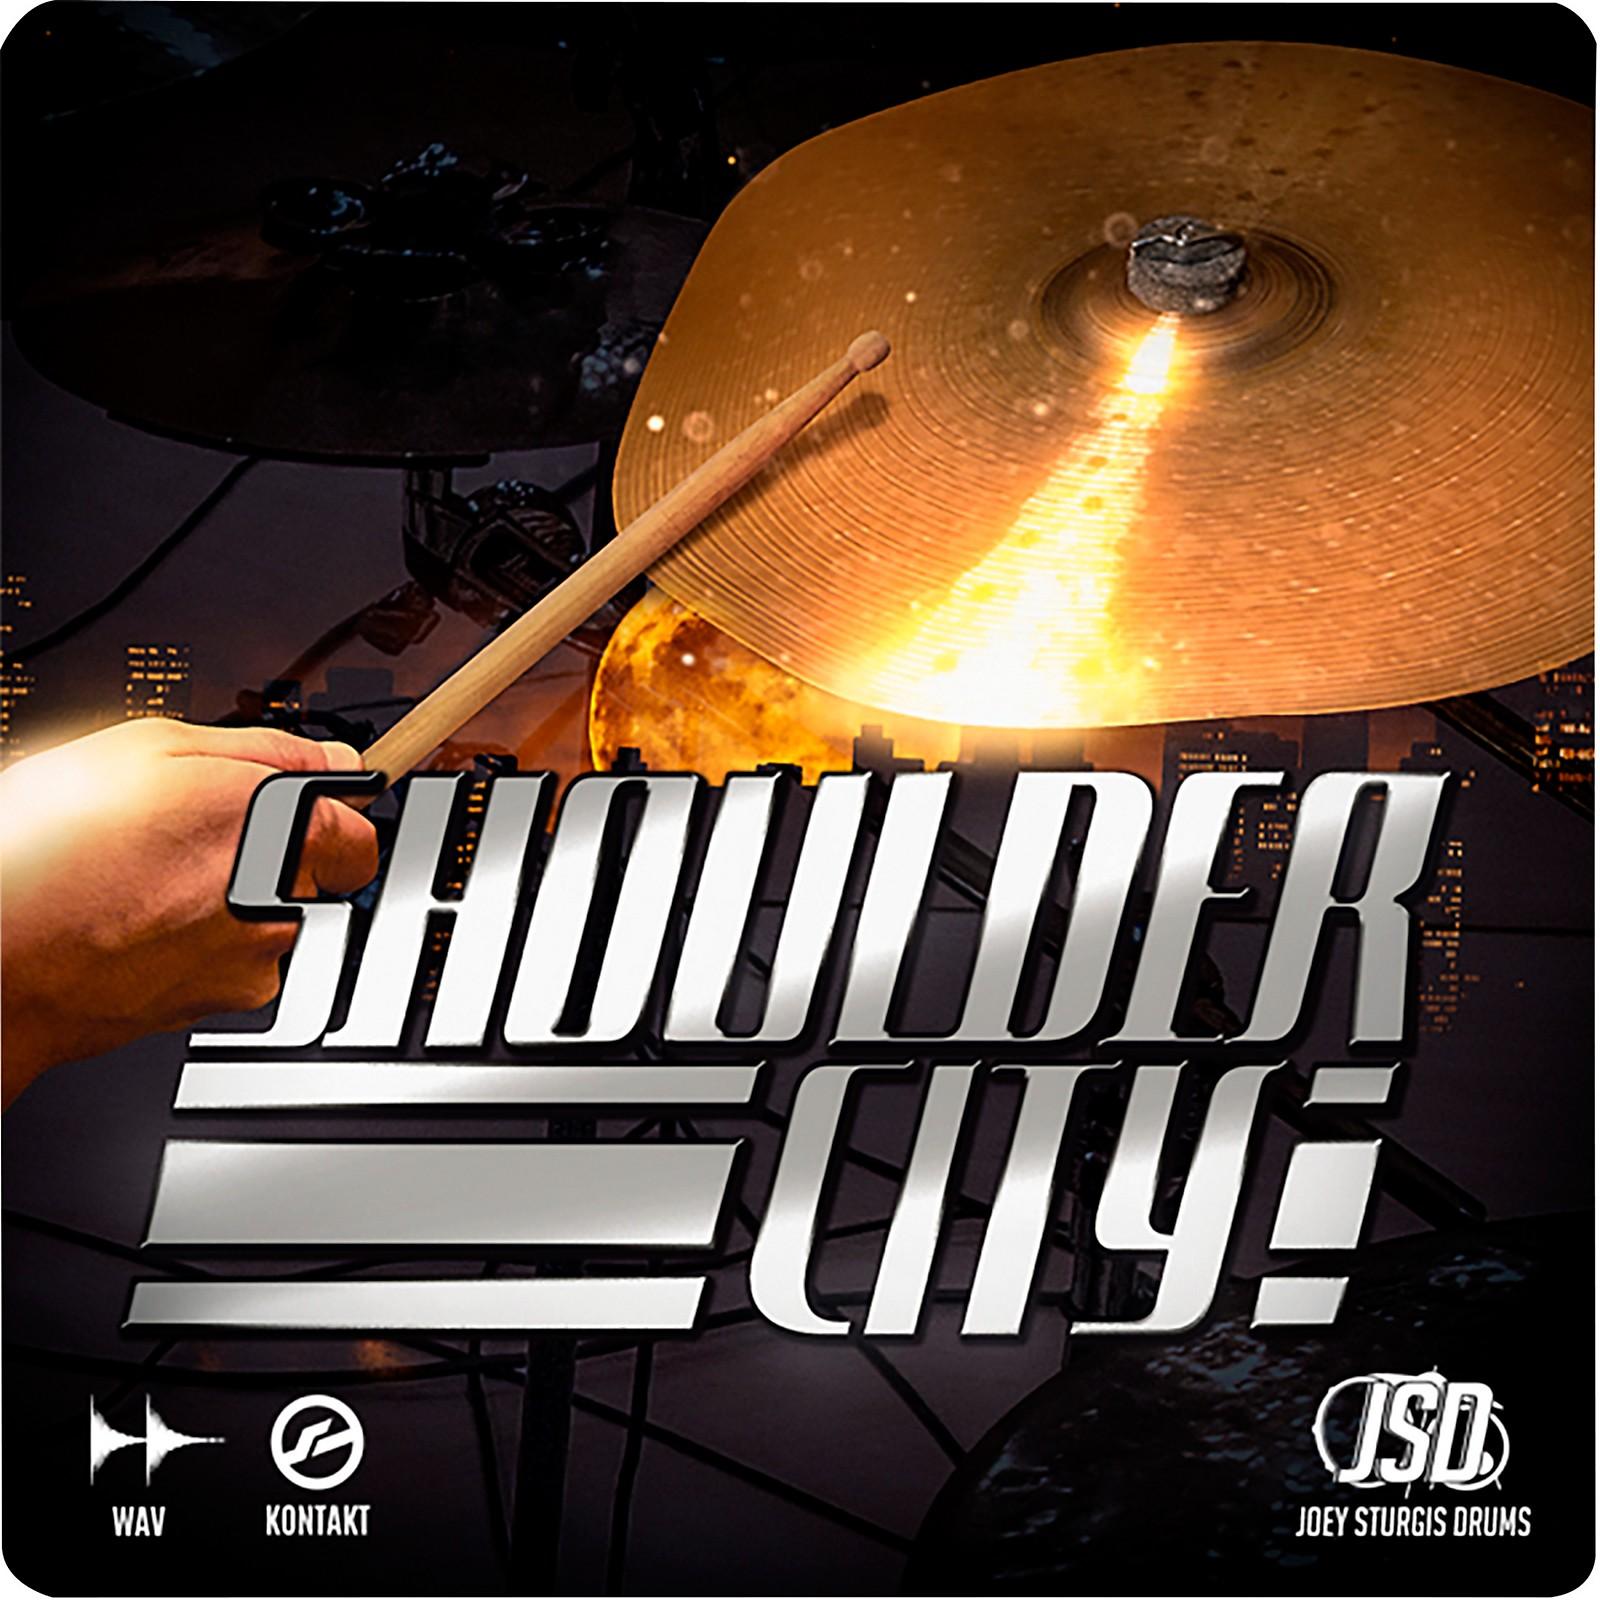 Joey Sturgis Drums Shoulder City Cymbals